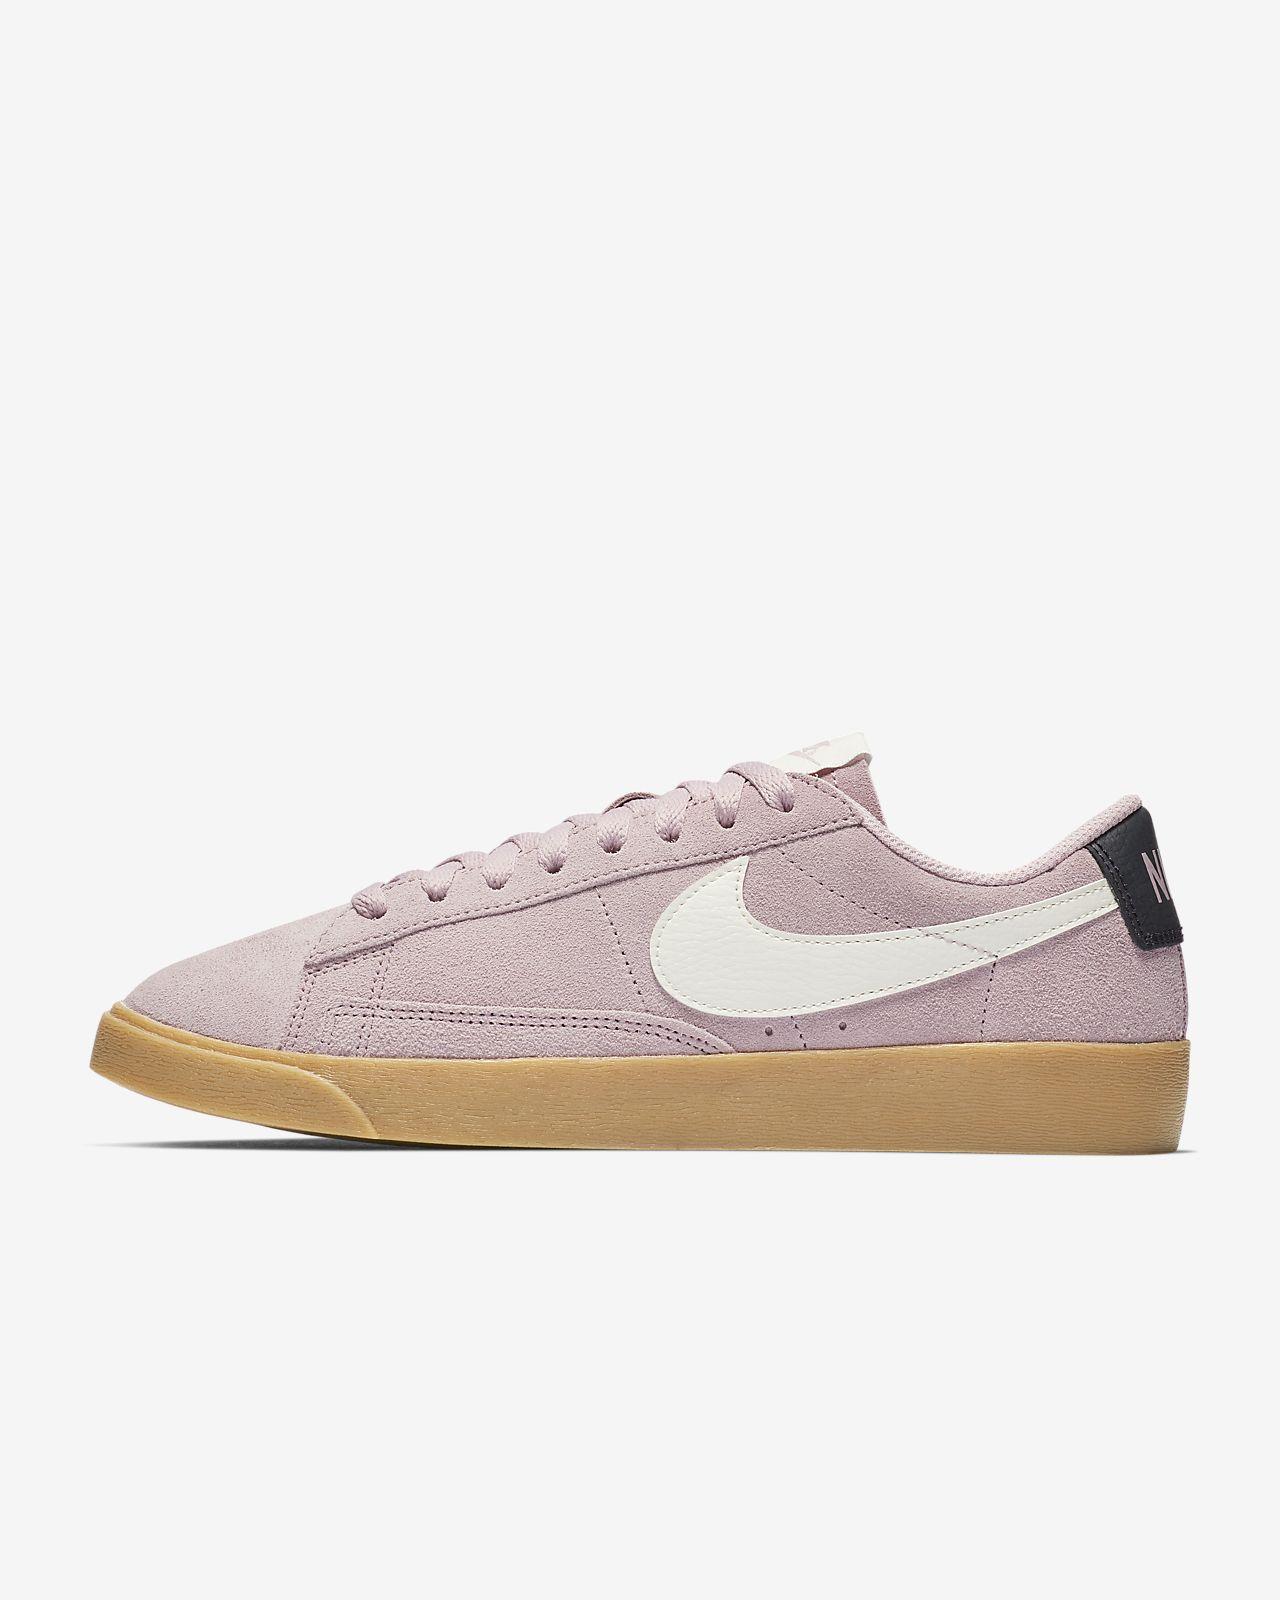 100% authentic bd889 2e8ab ... Nike Blazer Low Suede Women s Shoe